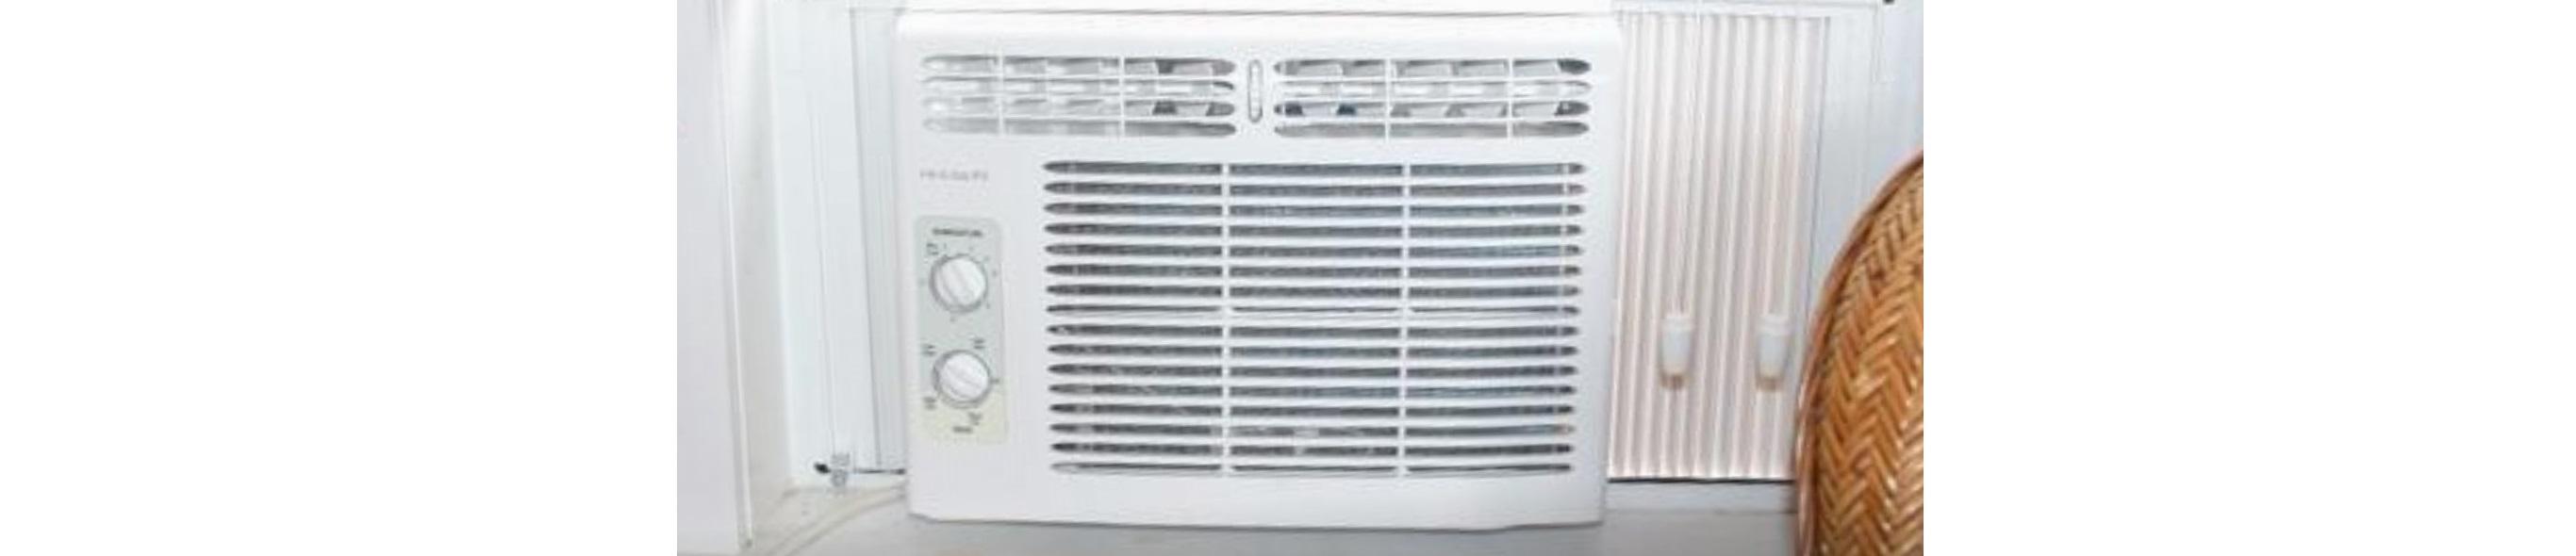 Frigidaire FFRA0511R1 Window Air Conditioner Review